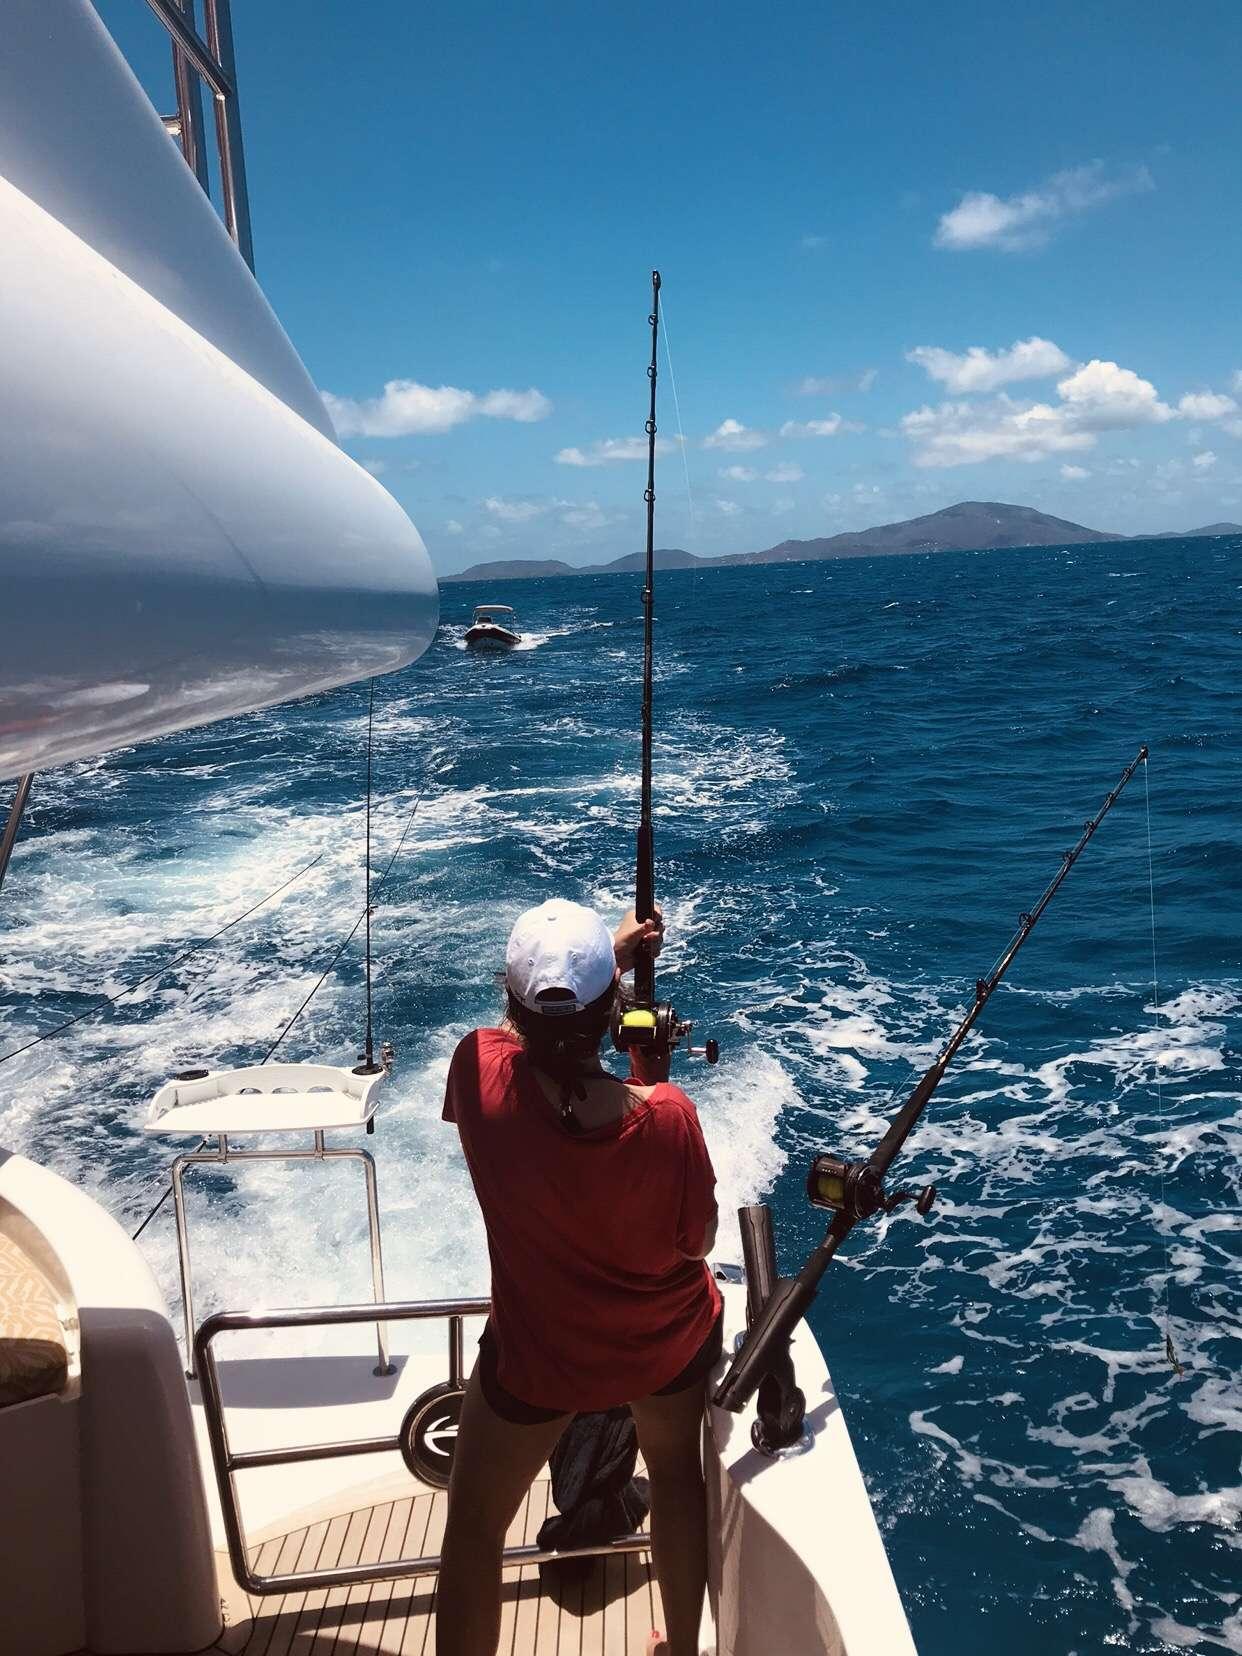 A spot of Fishing!